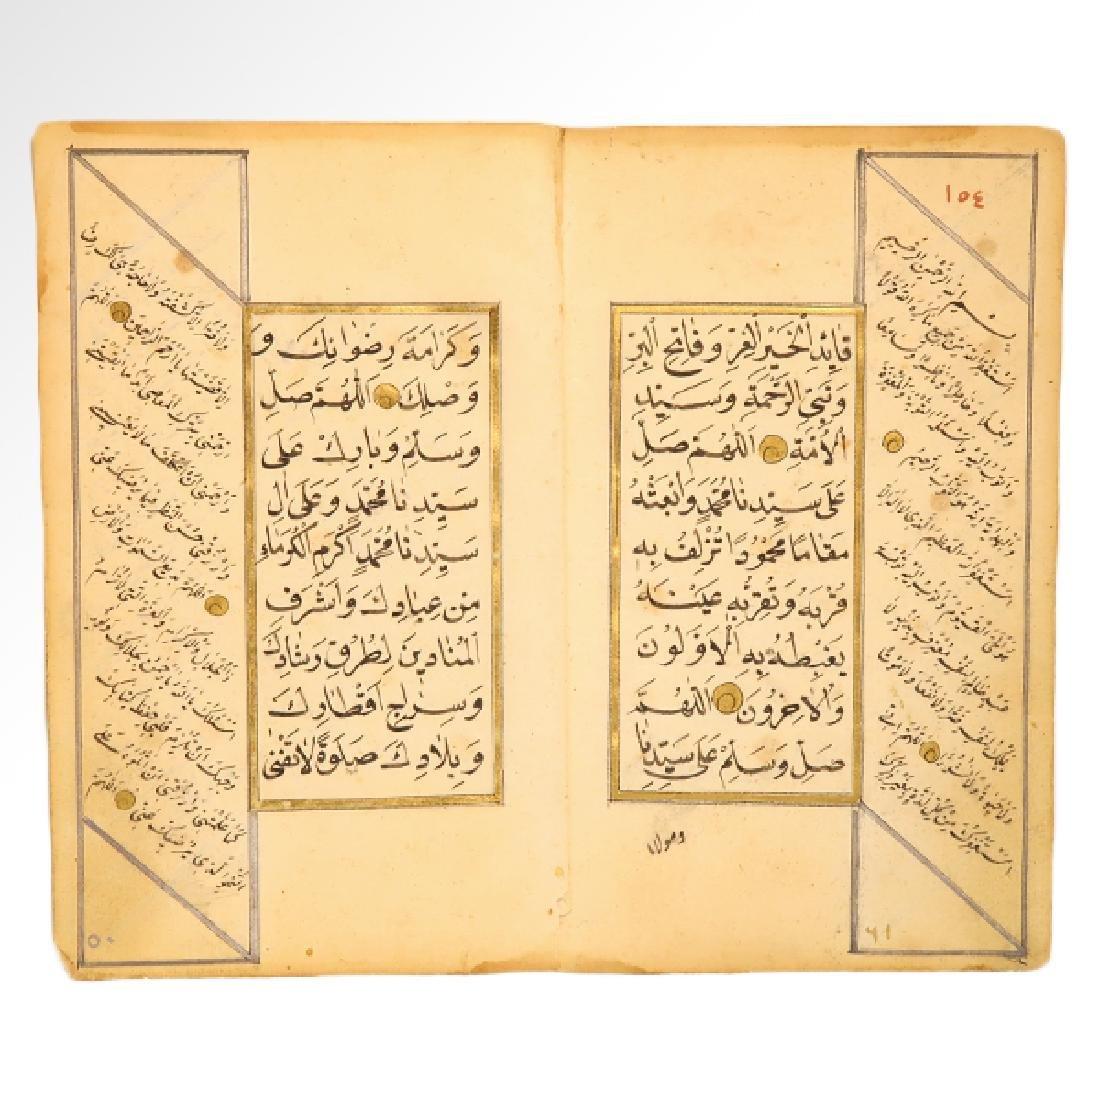 Arabic Illuminated/Gilt Manuscript Near East 16th C AD